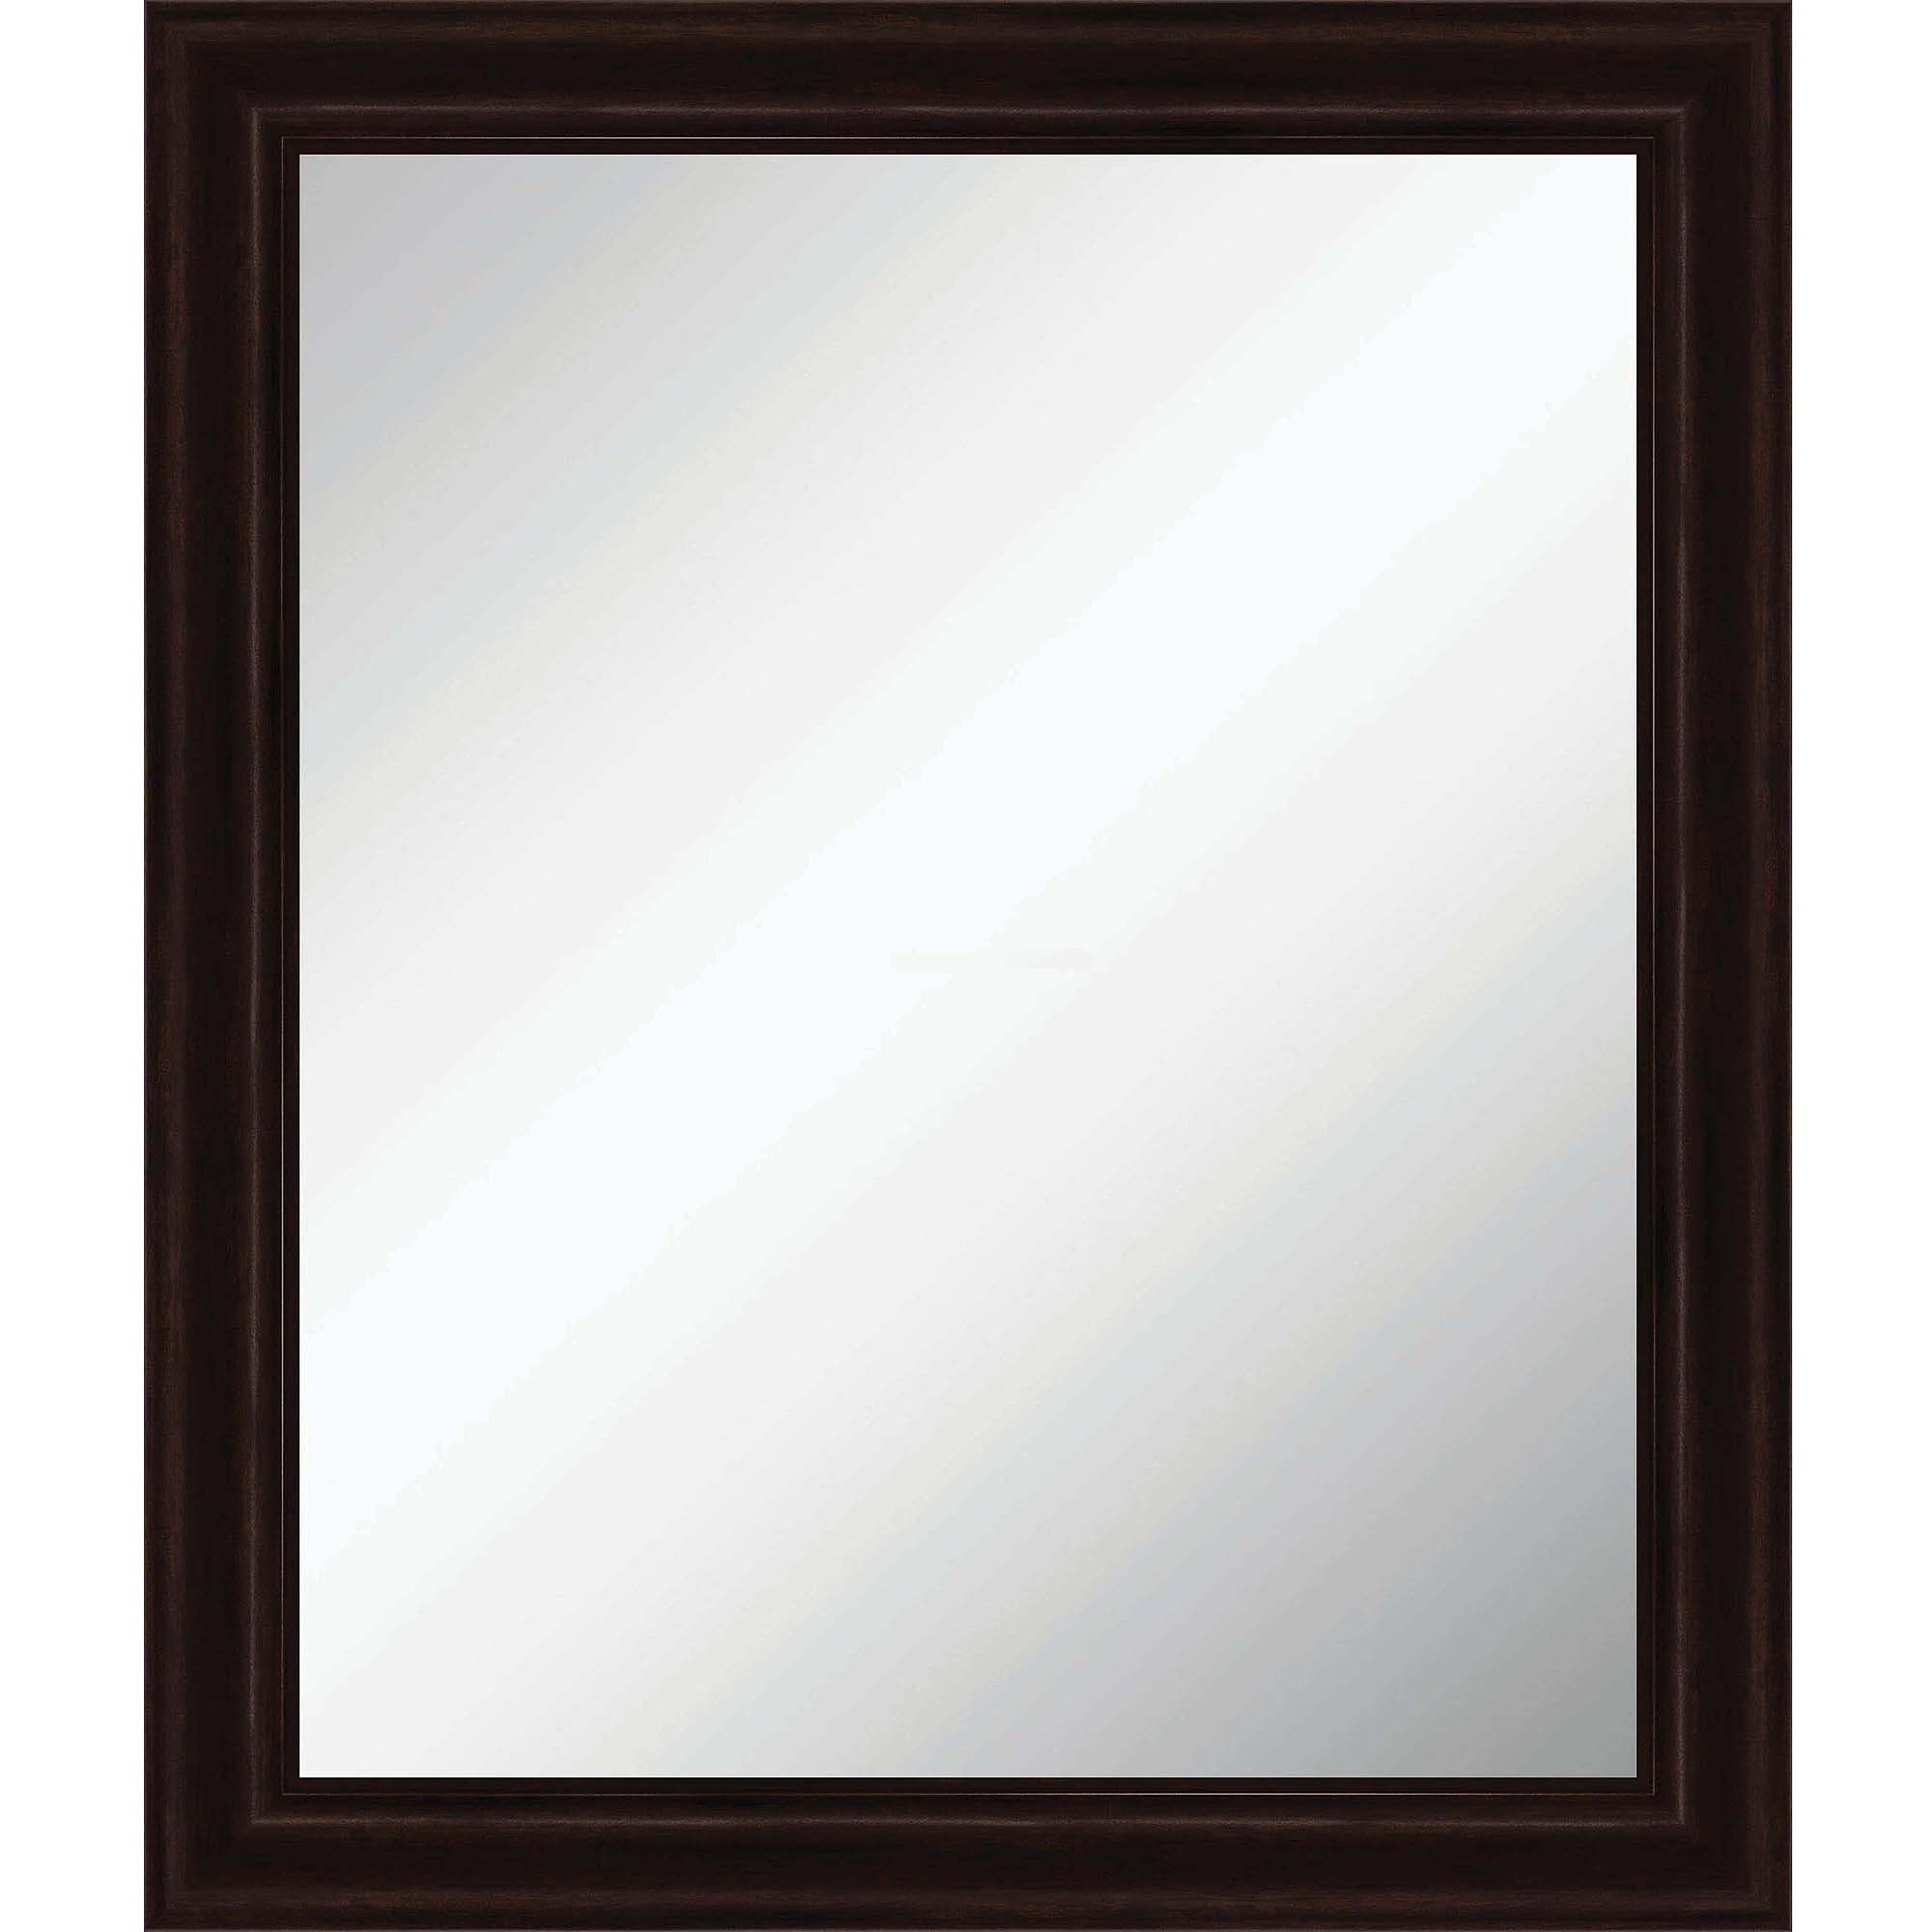 Montebello Over-the-Sink Mirror, Bronze